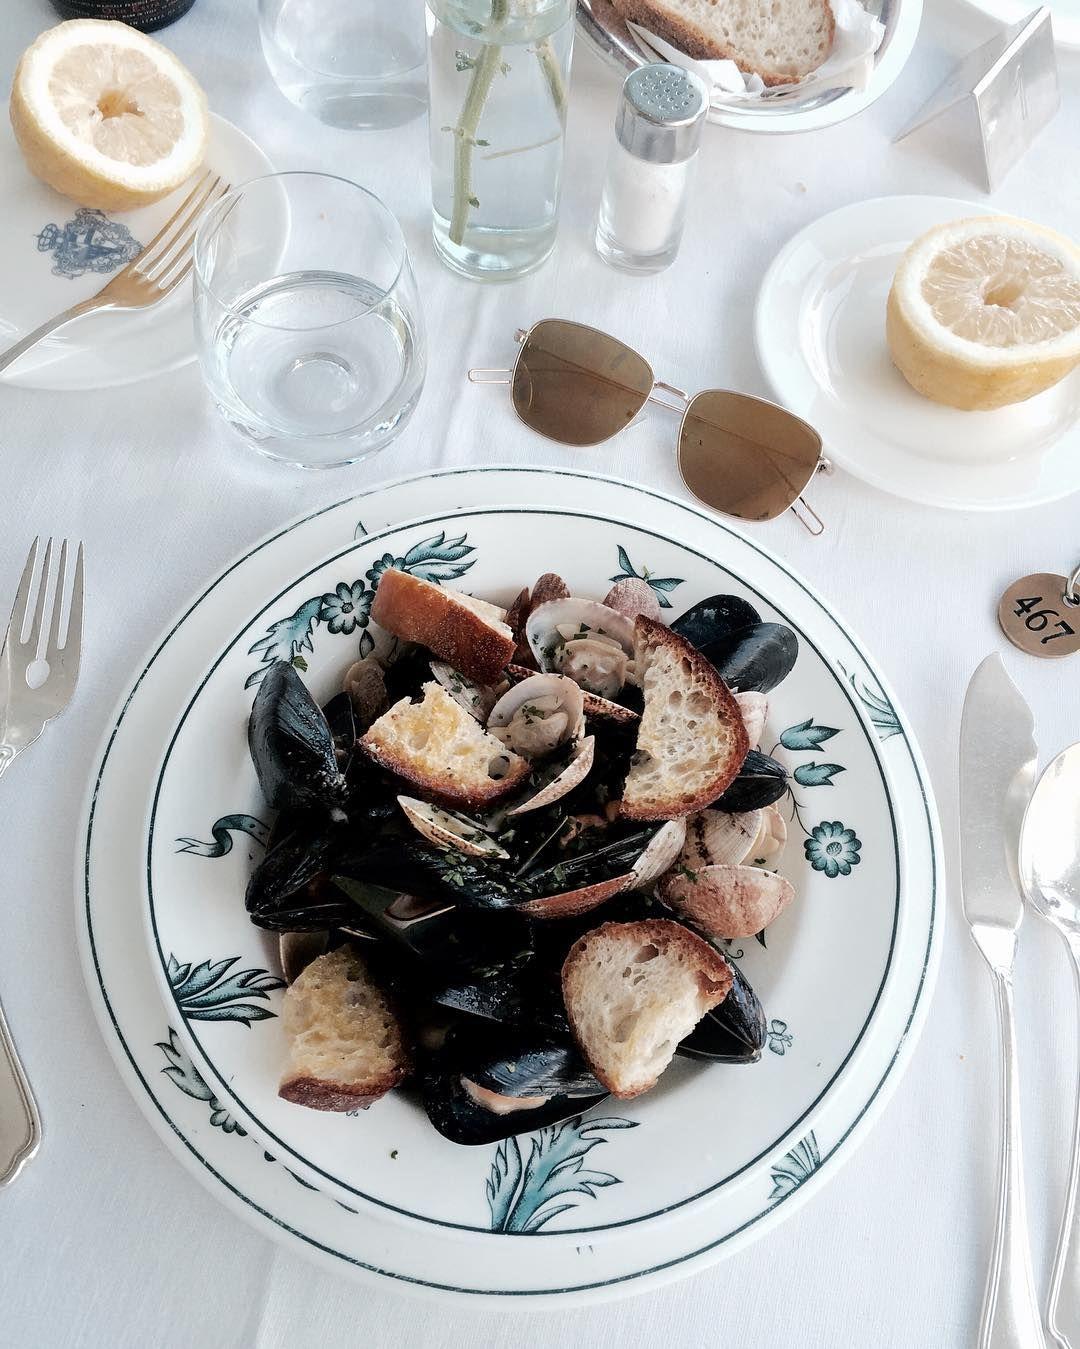 Perfect lunch! #AlbergoReginaIsabella #myReginaIsabella #luxuryhotel @regina.isabella